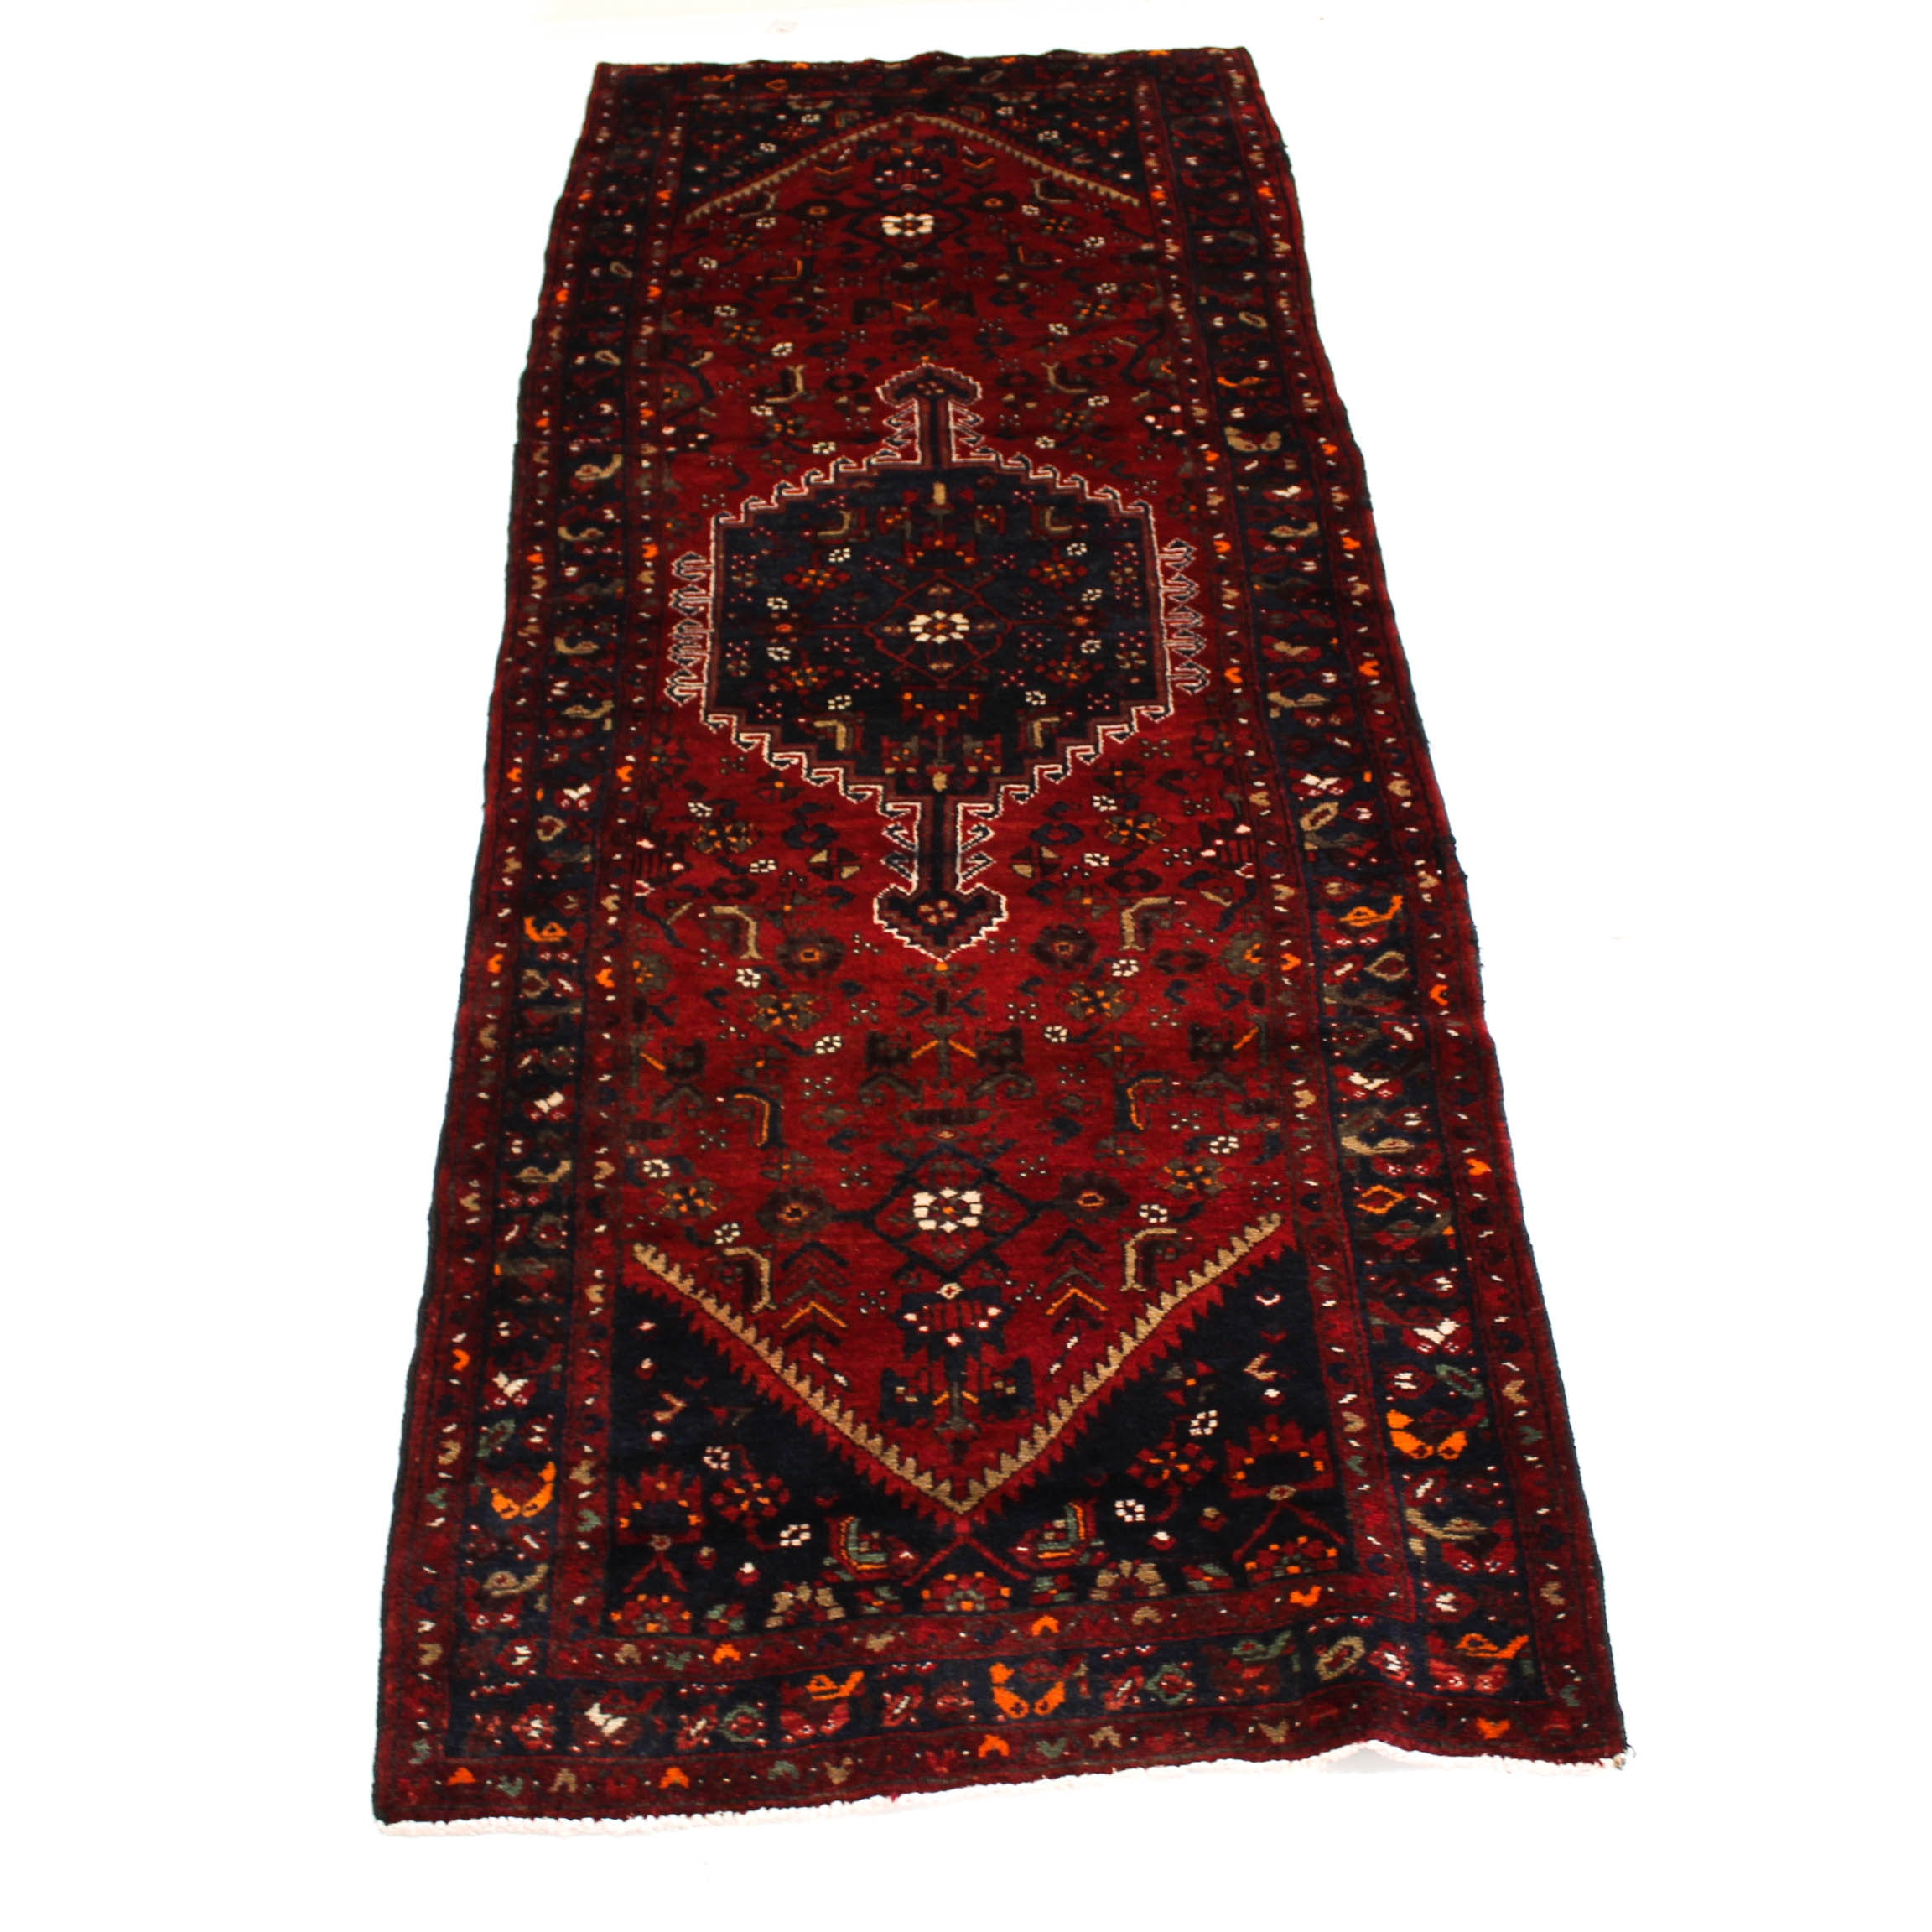 3'9 x 10'4 Semi-Antique Hand-Knotted Persian Zanjan Carpet Runner